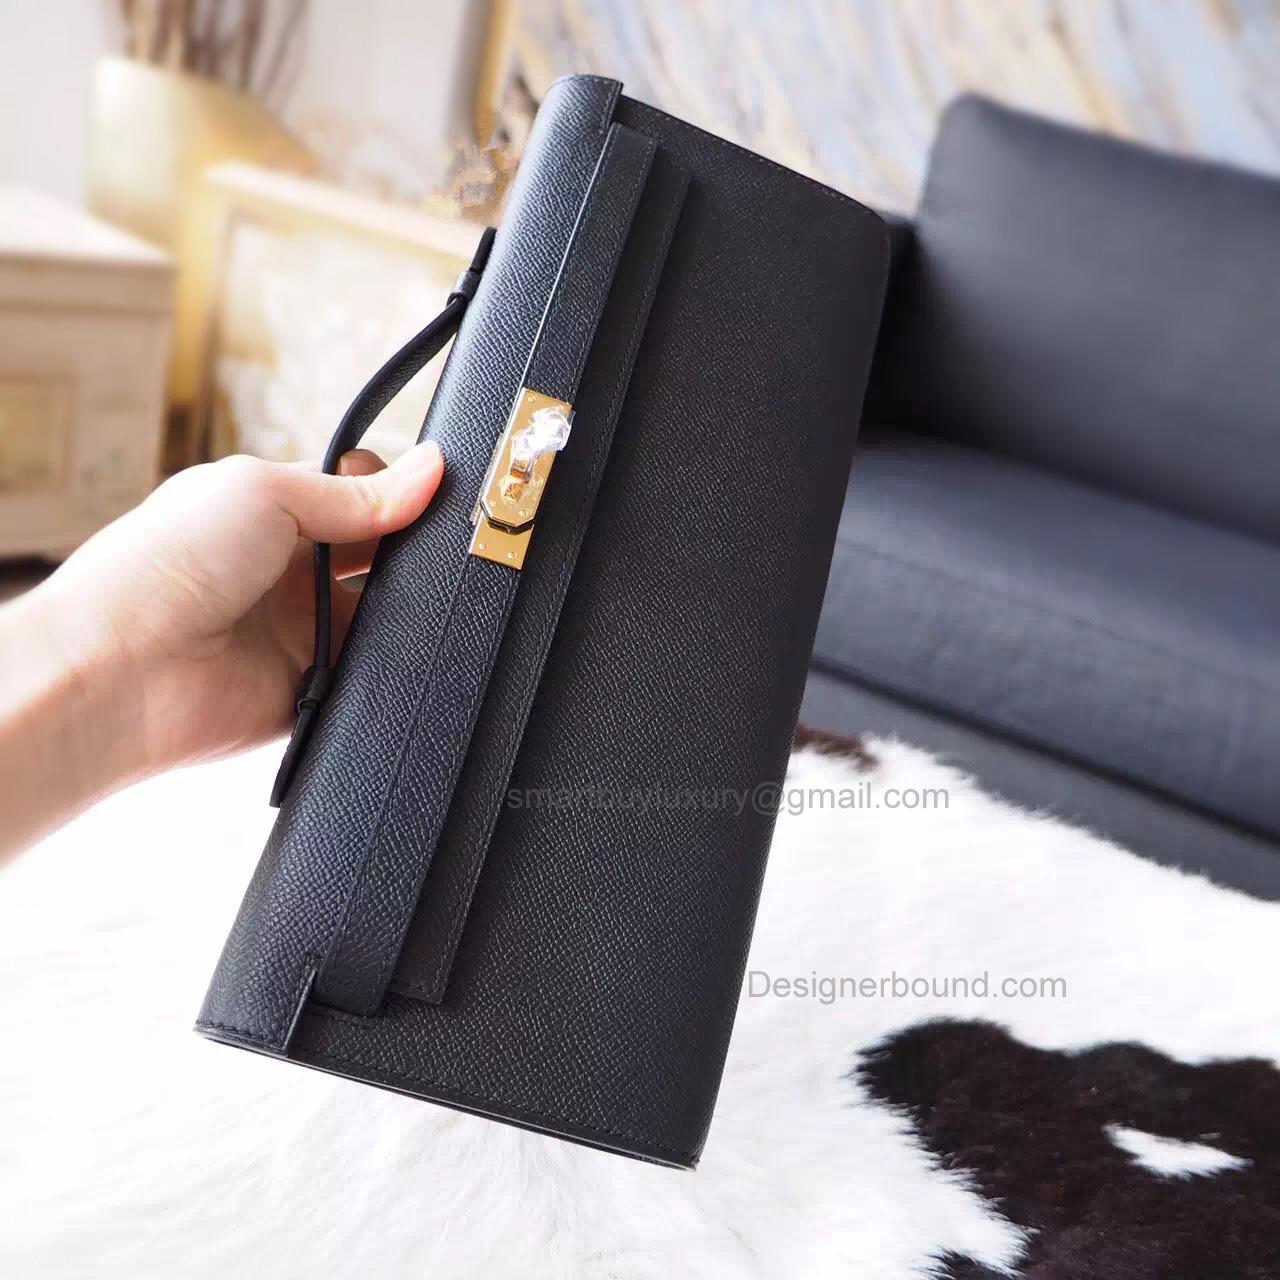 800d7bdc5f1e8 Handmade Hermes Kelly Cut Copy Clutch in ck89 Noir Epsom Calfskin GHW -